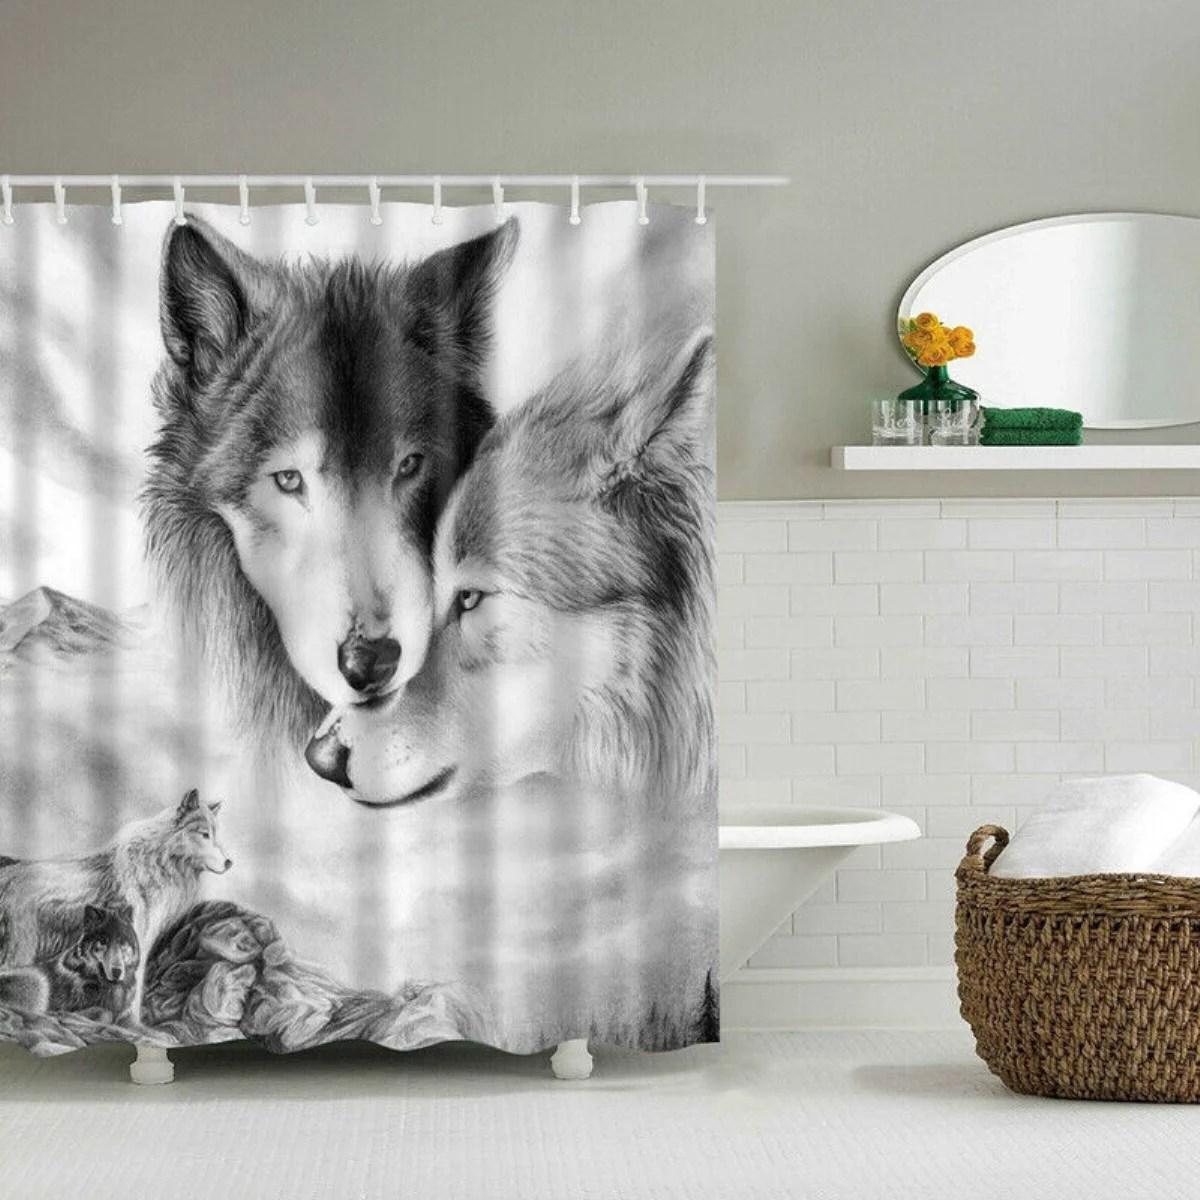 180x180cm winter white grey wolf shower curtain bathroom waterproof polyester bath curtains 12pcs hooks walmart com